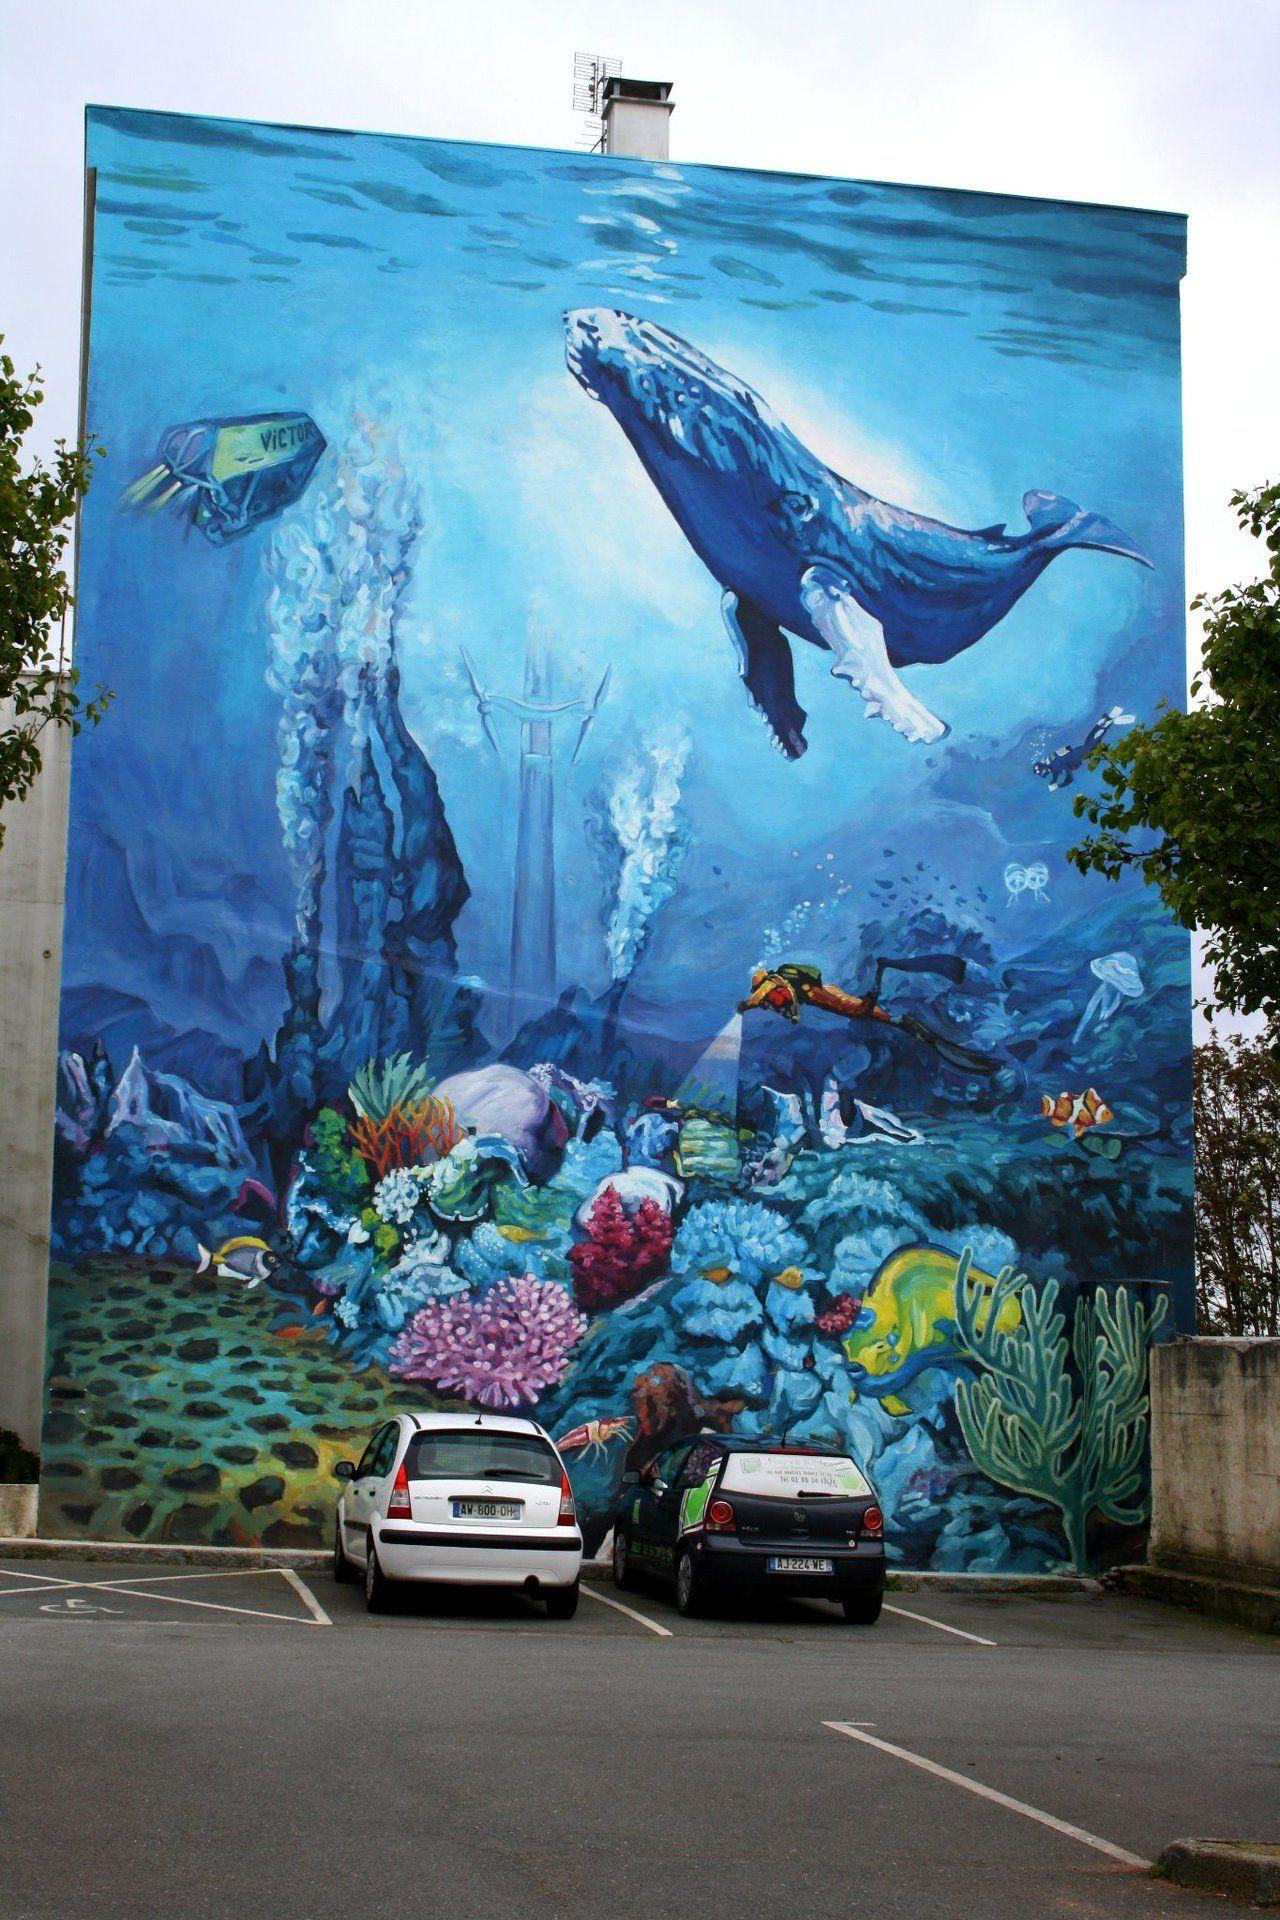 Street Art La Mer - Brest France. In 2019 Artistic Eye